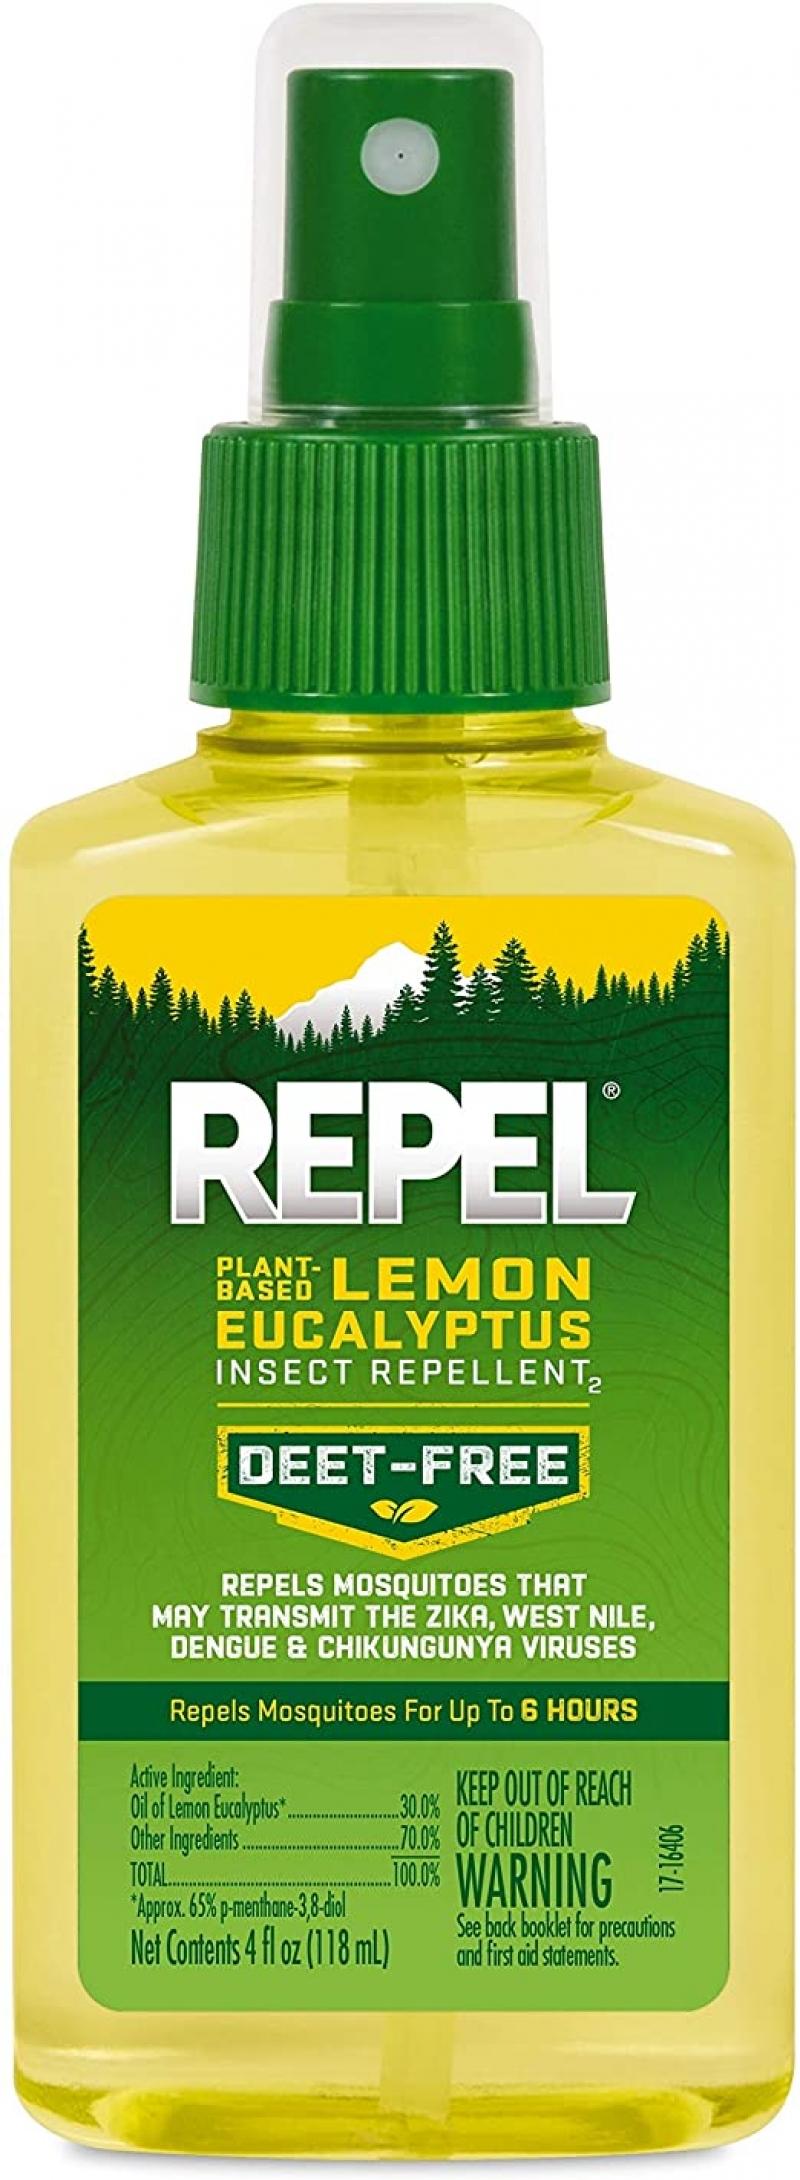 ihocon: REPEL Plant-Based Lemon Eucalyptus Insect Repellent, Pump Spray, 4-Ounce 天然驅蚊/蟲噴霧